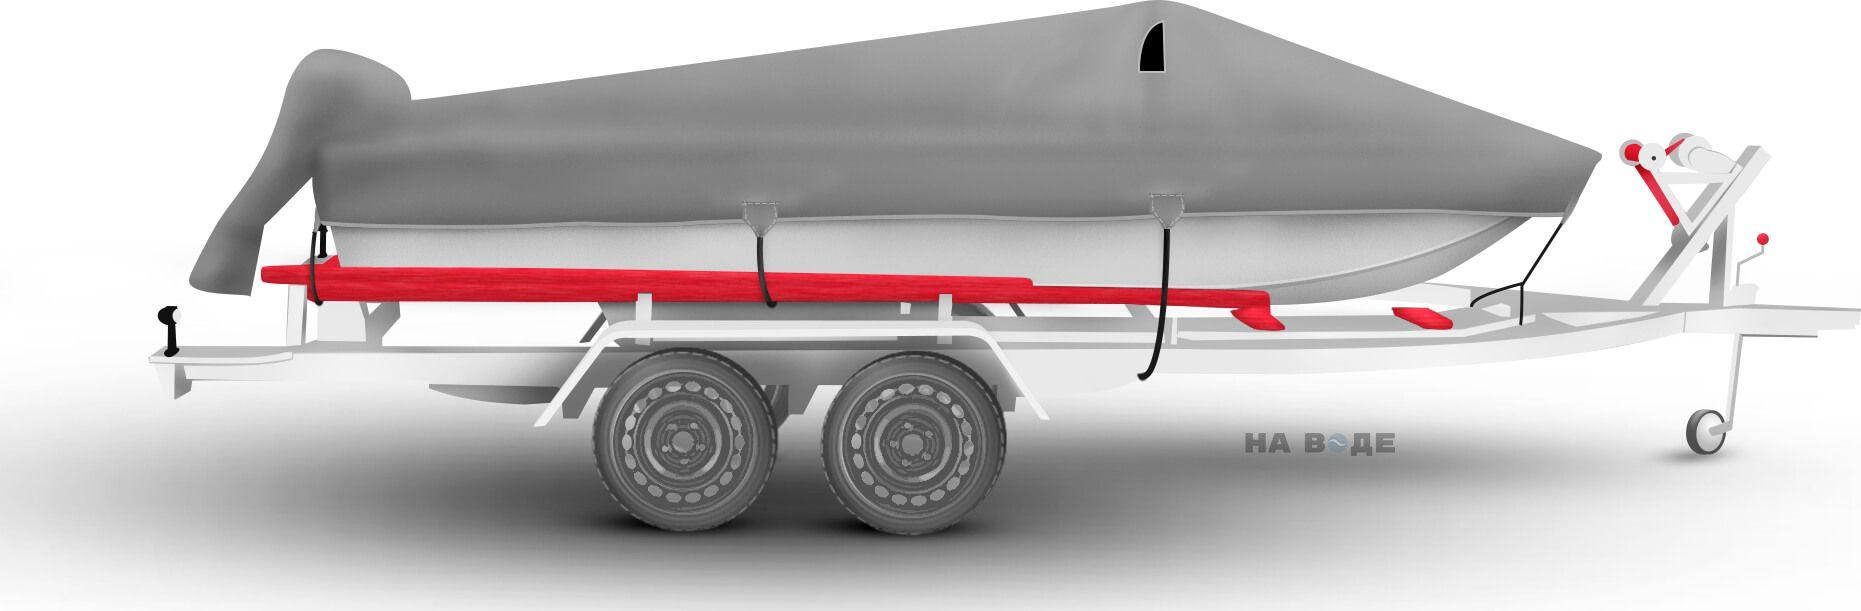 Транспортировочный тент на лодку Сарепта без рубки комплектация C накрытием мотора - фото 3